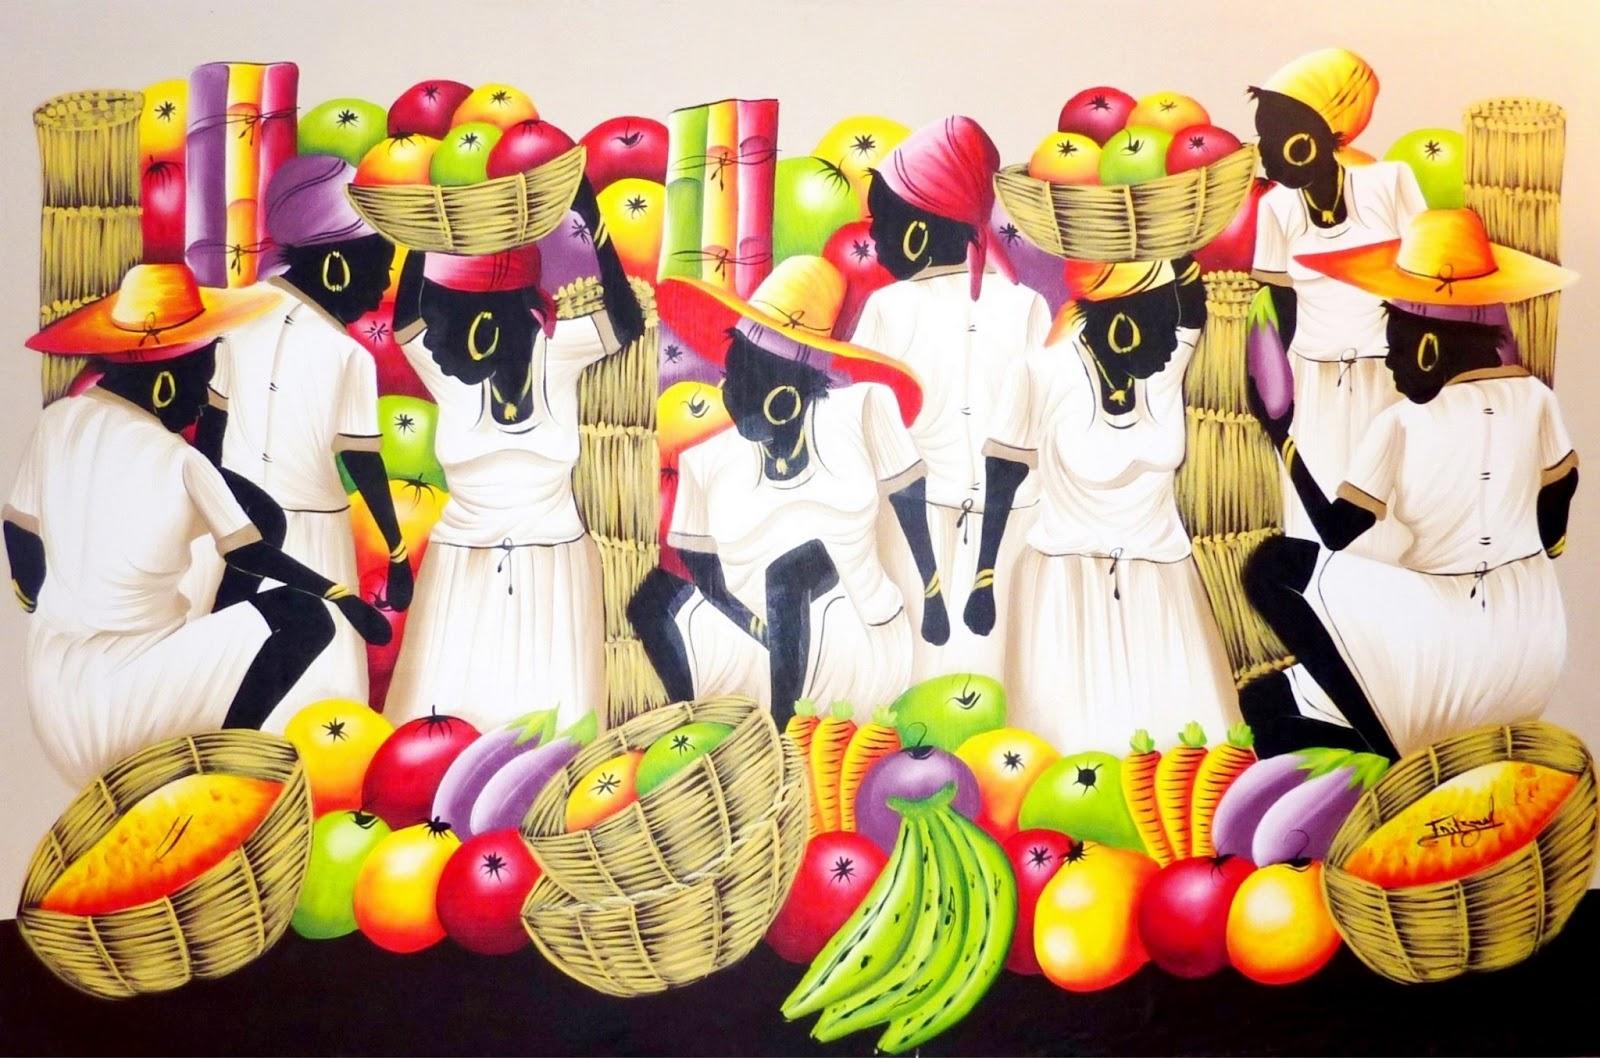 Cuadros modernos pinturas y dibujos cuadros para cocina - Cuadros decorativos para cocina abstractos modernos ...